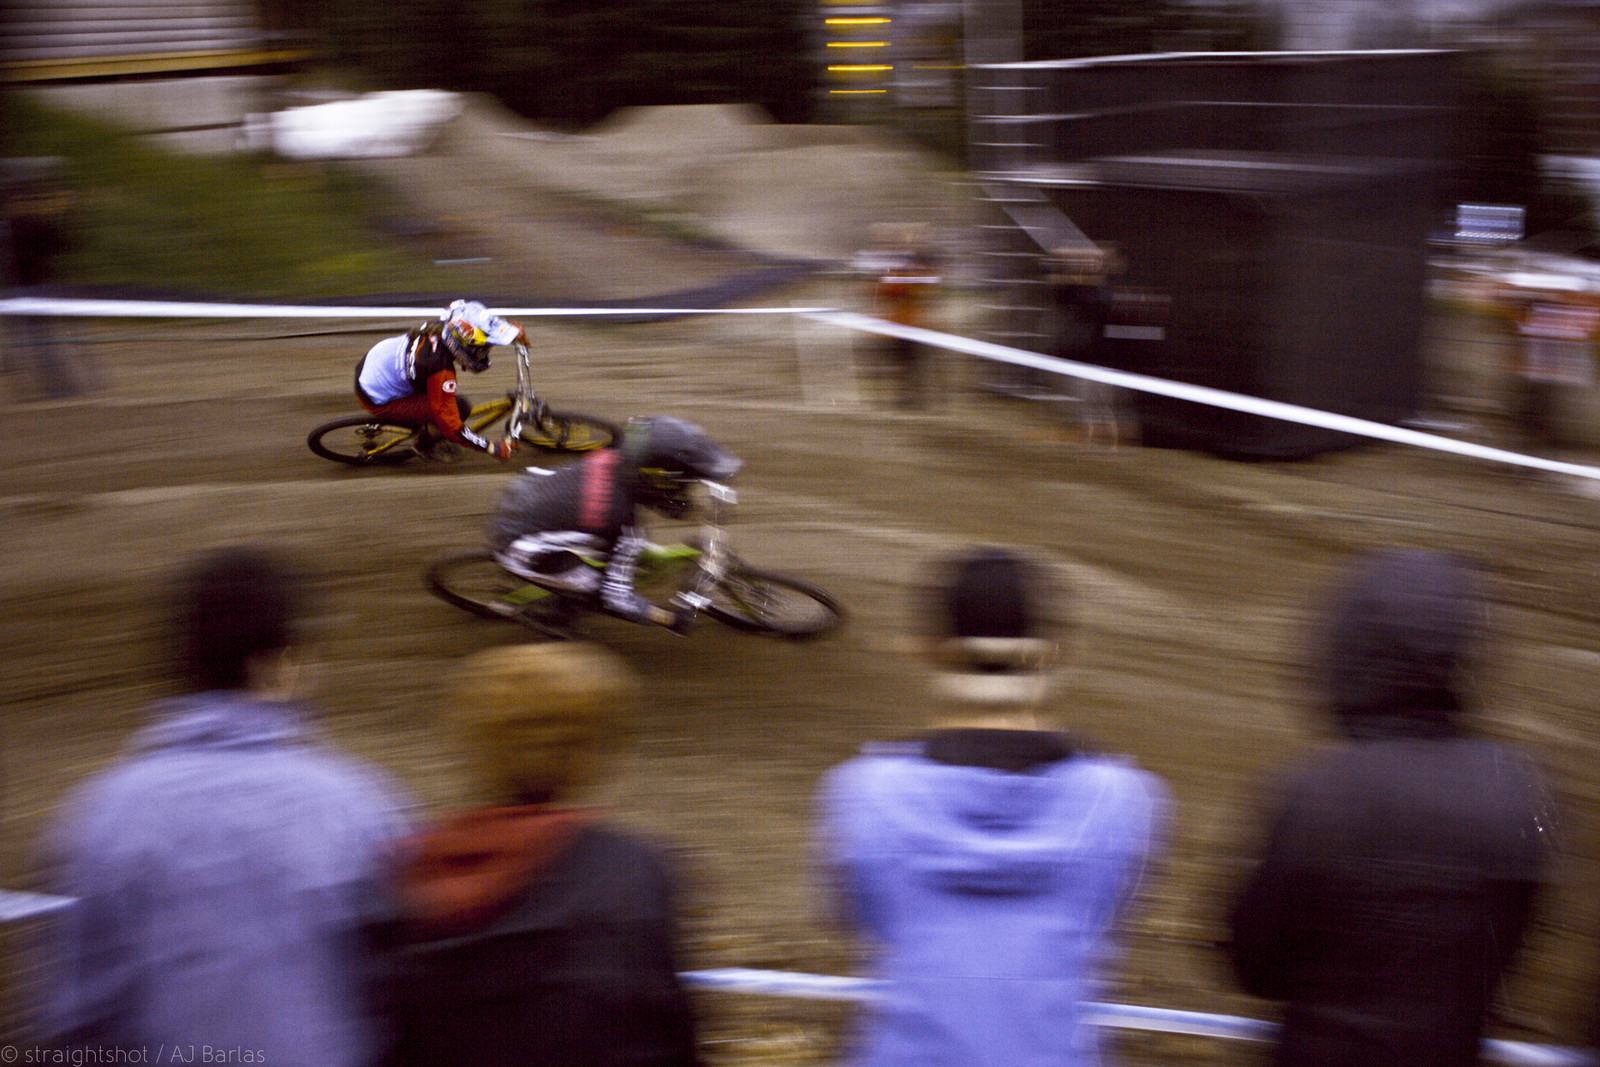 Kintner Focused on Finals, Beating out Anneke Beerton - Crankworx Slalom 2013 - Mountain Biking Pictures - Vital MTB